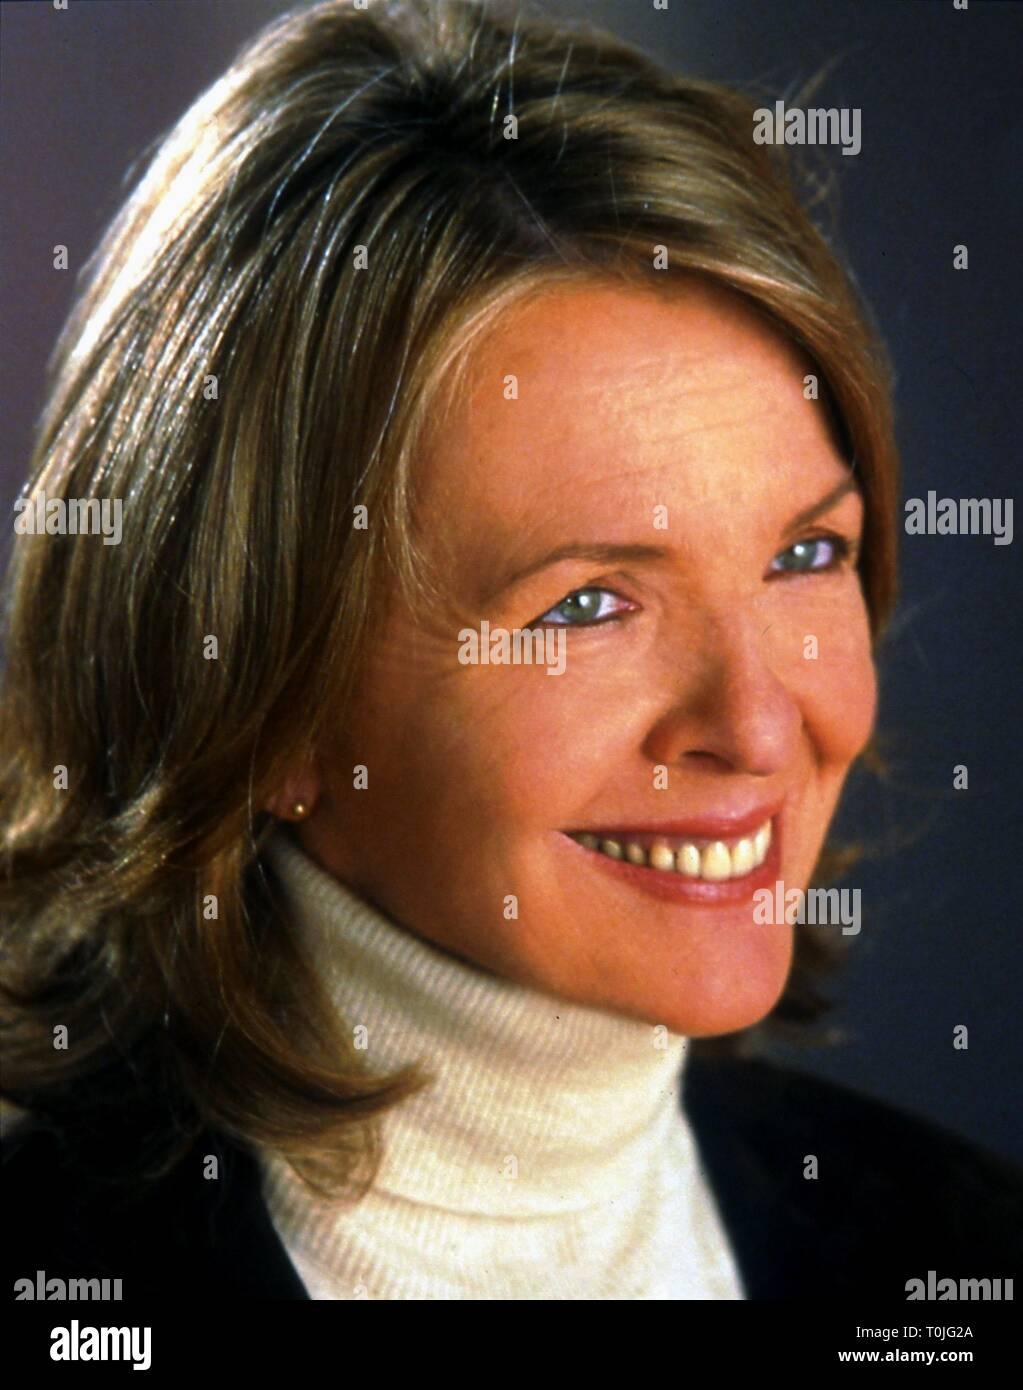 DIANE KEATON, SOMETHING'S GOTTA GIVE, 2003 - Stock Image